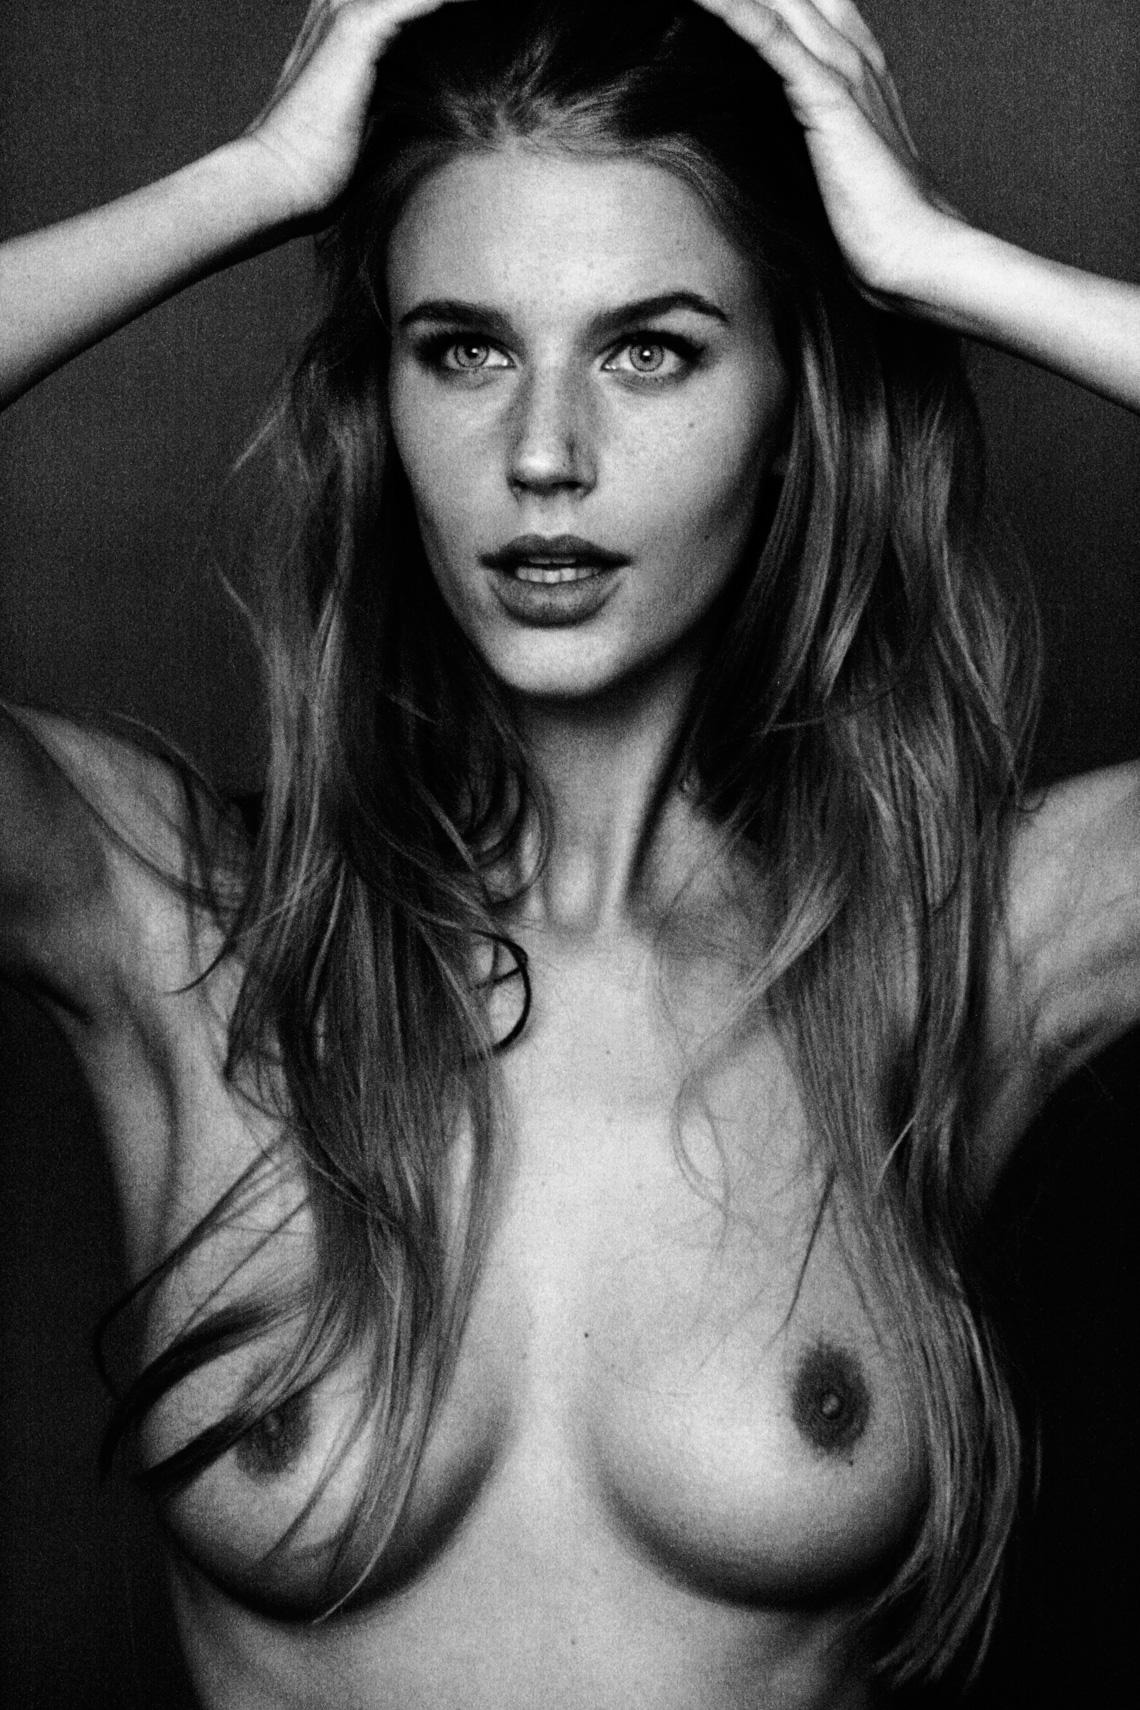 Ванесса Хромик / Vanessa Chromik nude by Luigi Miano - Yume